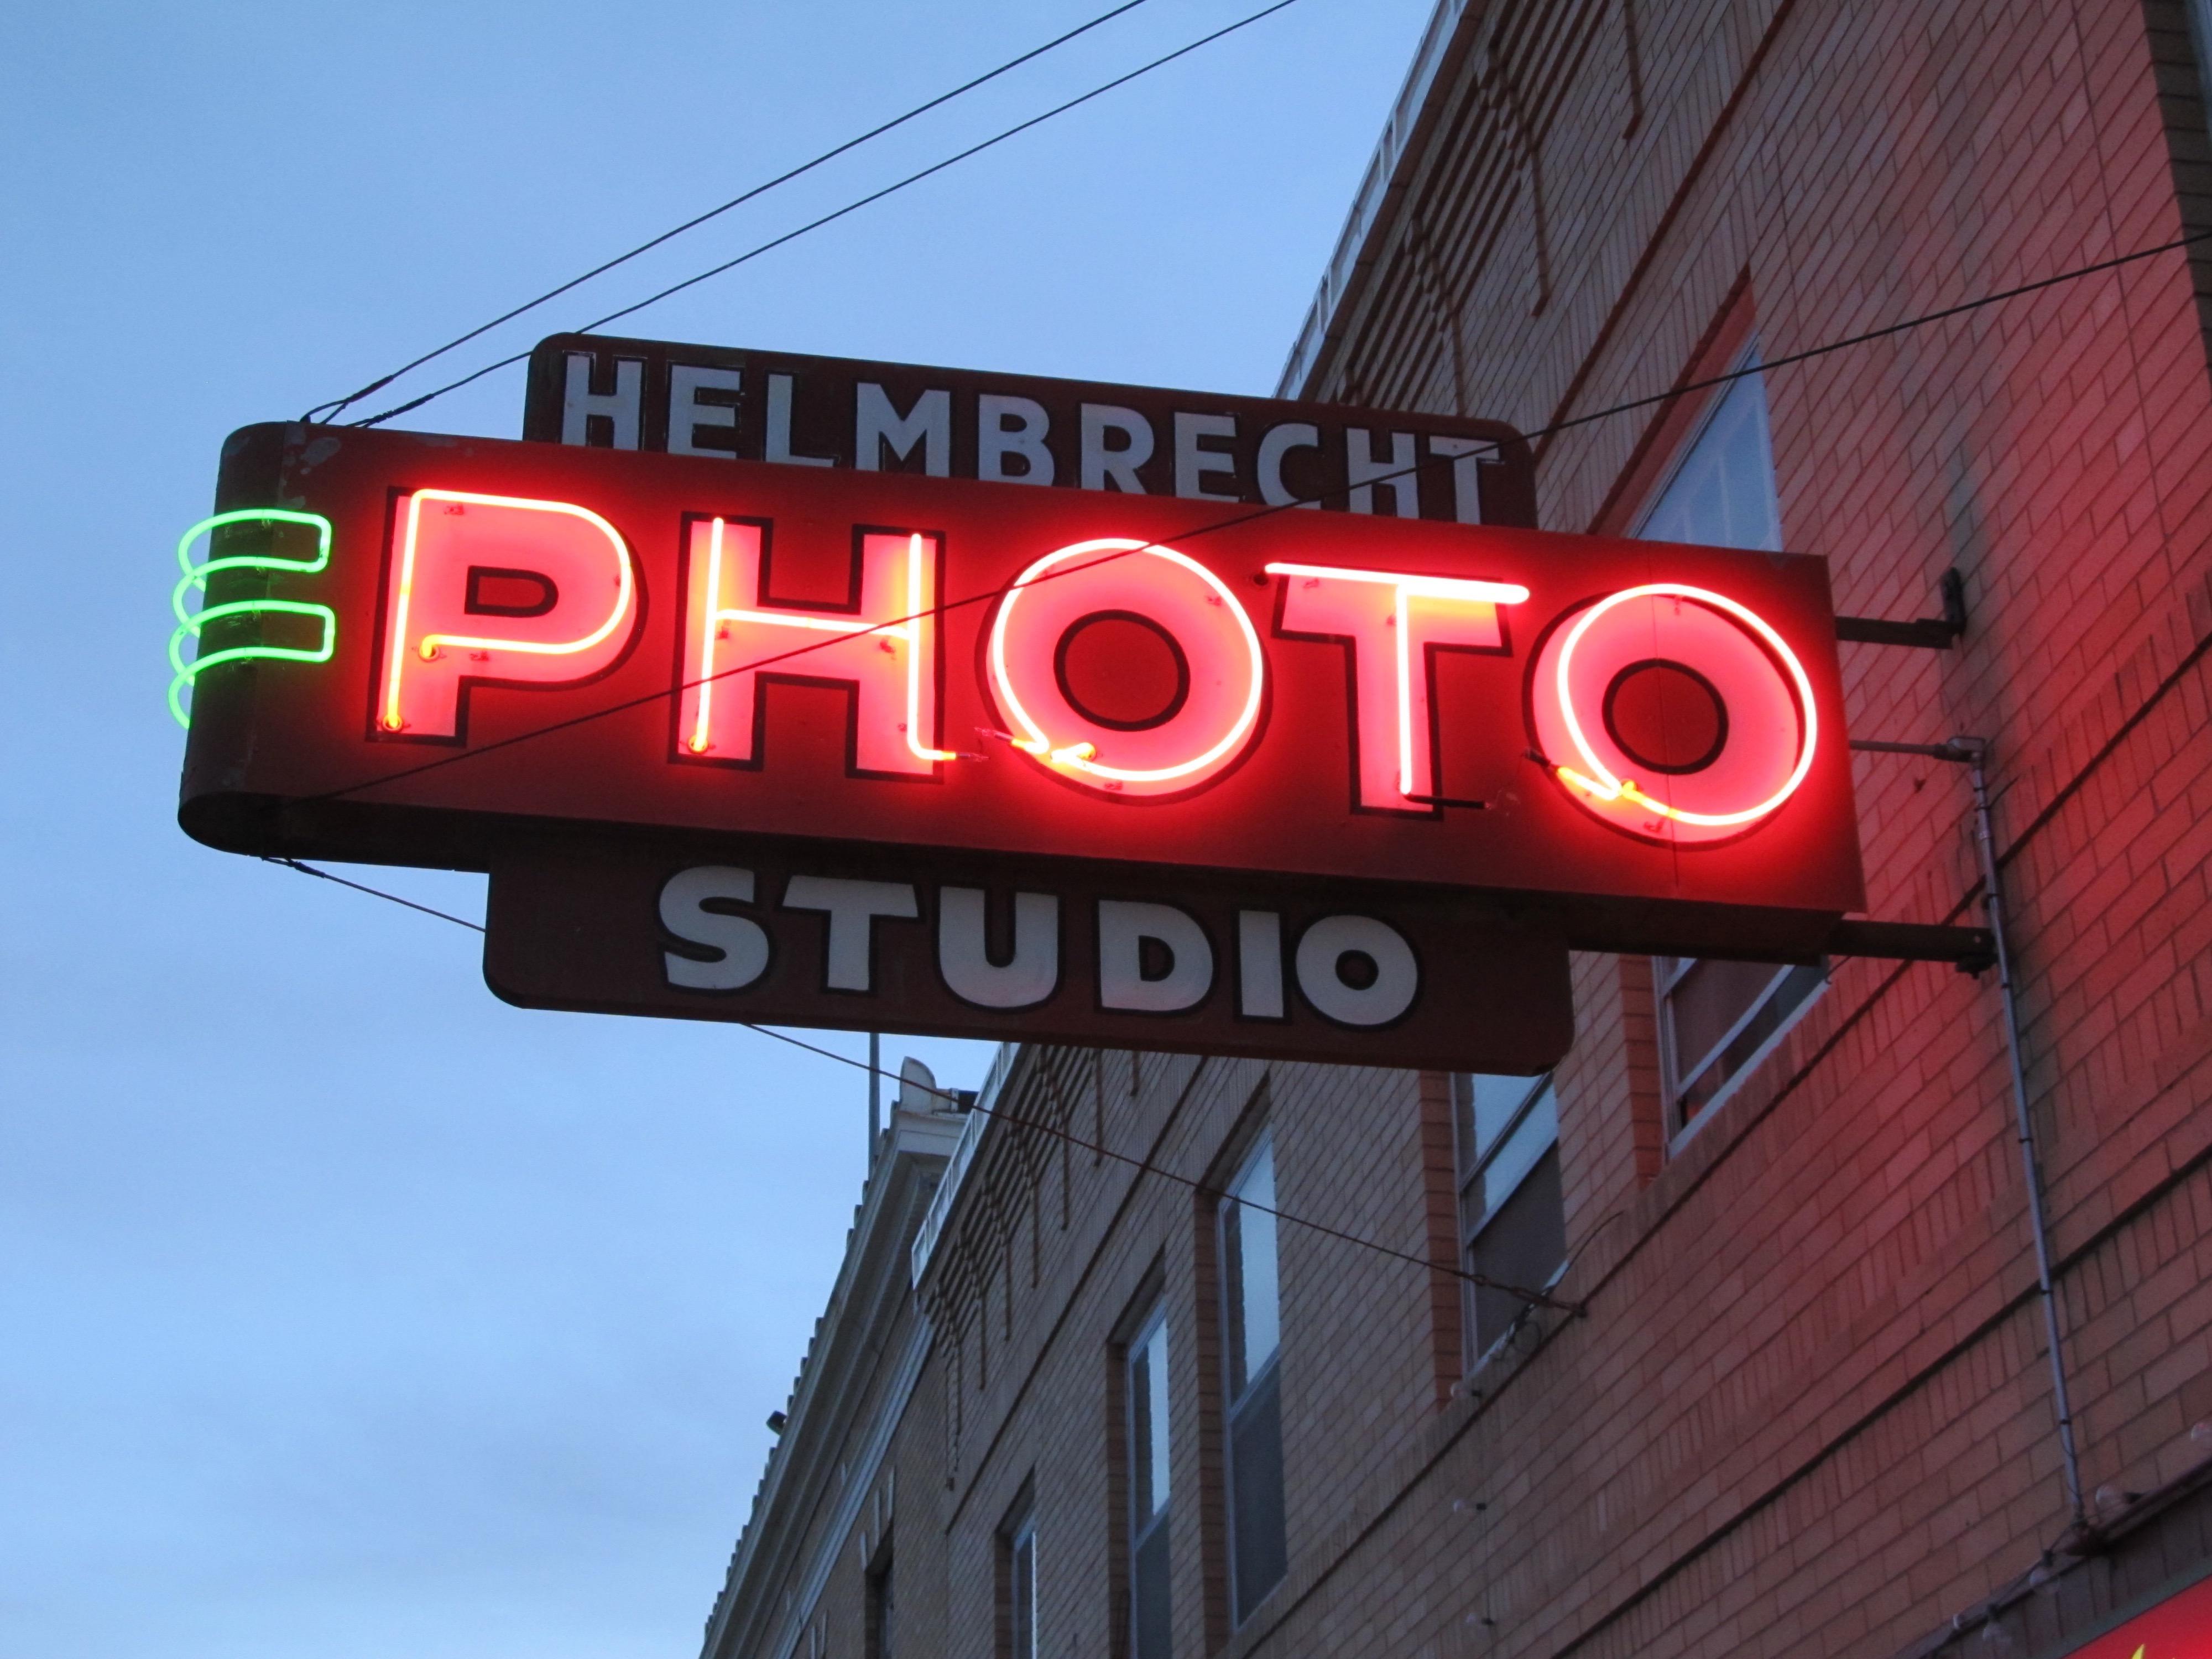 Helmbrecht Photo Studio - 224 4th Avenue, Havre, Montana U.S.A. - February 26, 2016